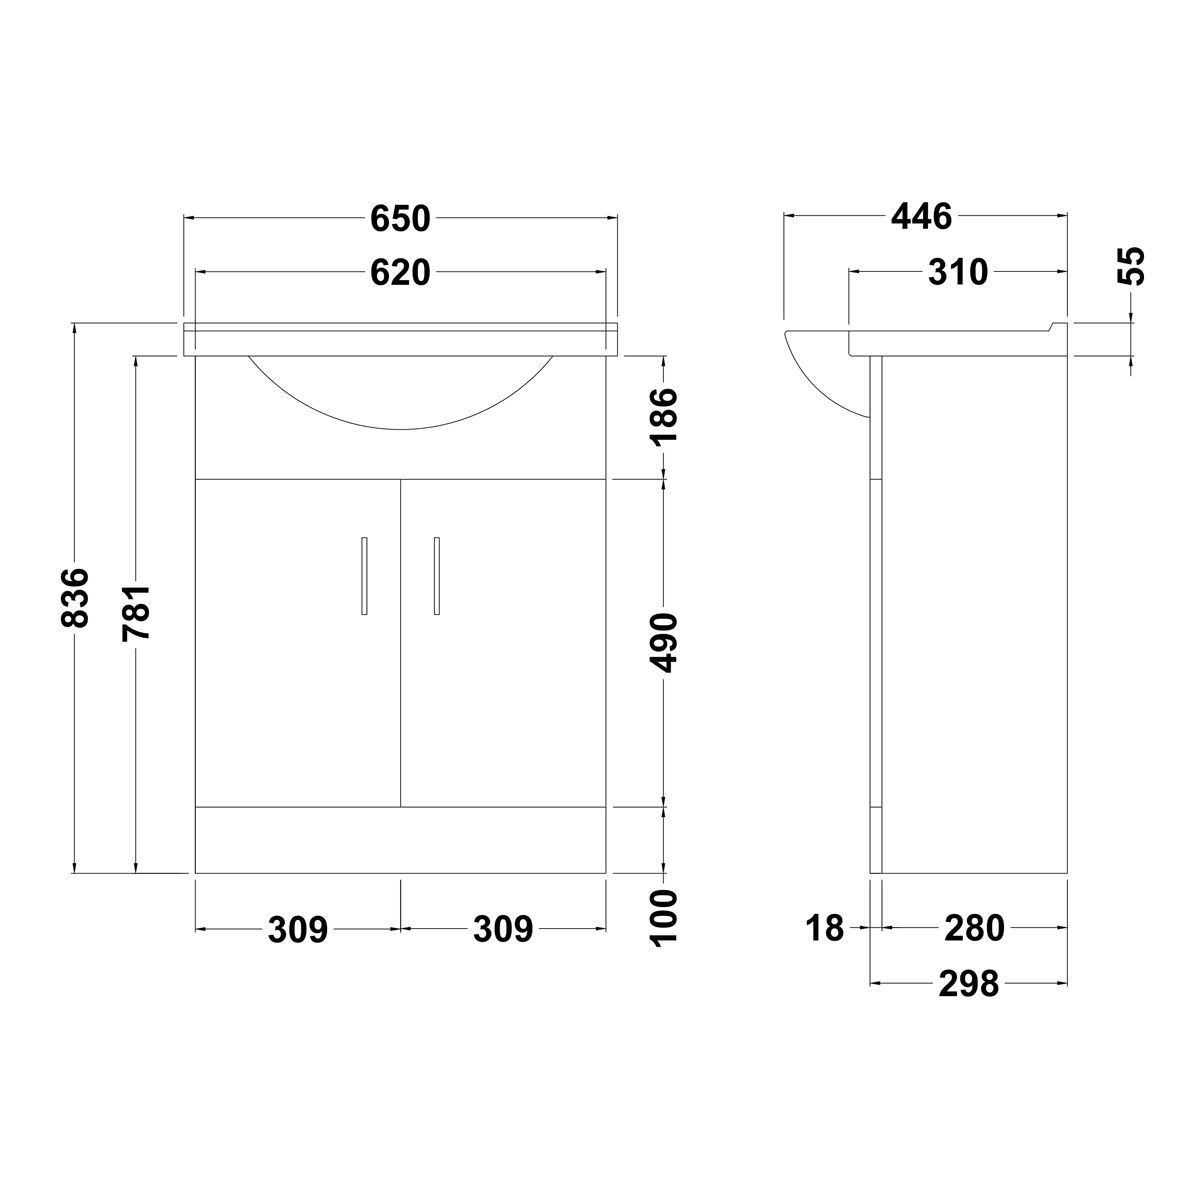 Premier High Gloss White Vanity Unit 650mm Dimensions